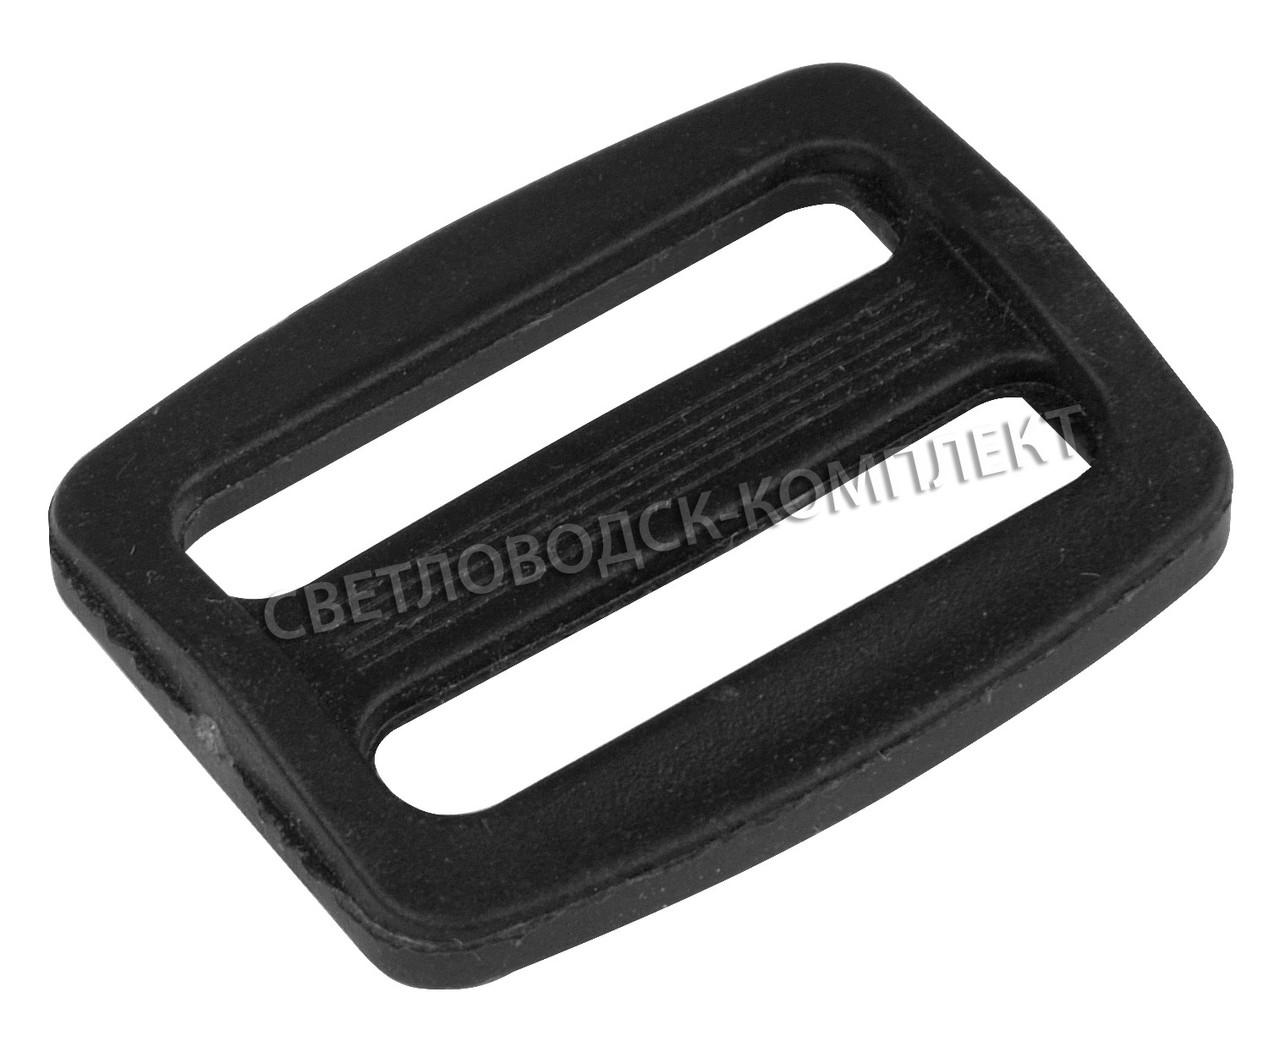 Пряжка 2-х щелевая 25 мм пластик, цв. чёрный, арт. РП/2-2515